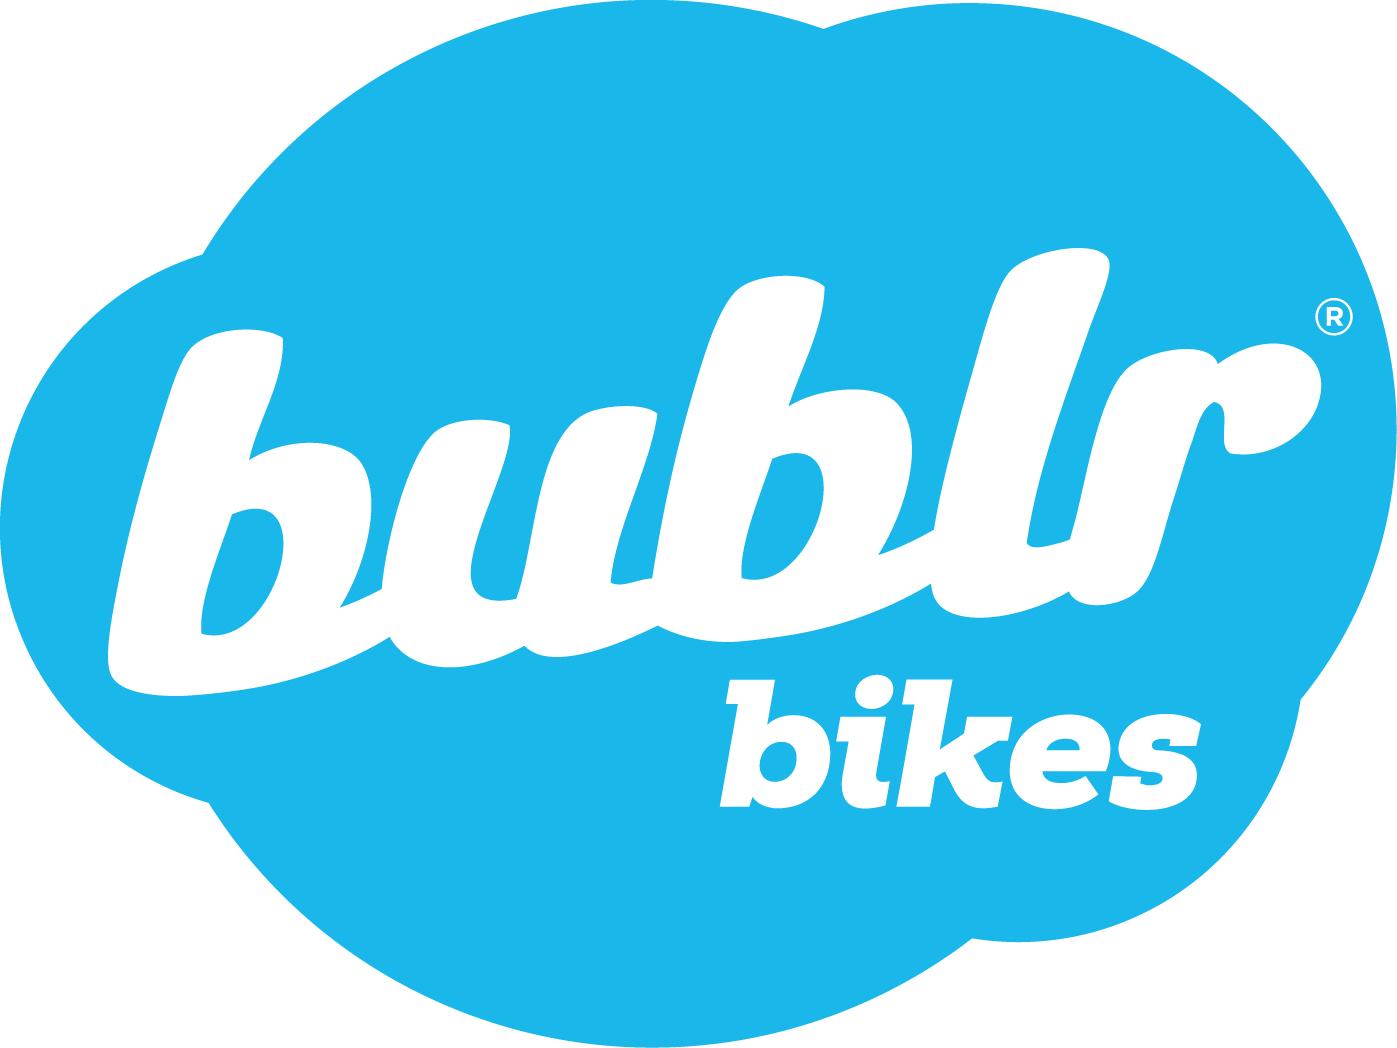 Bublr logo